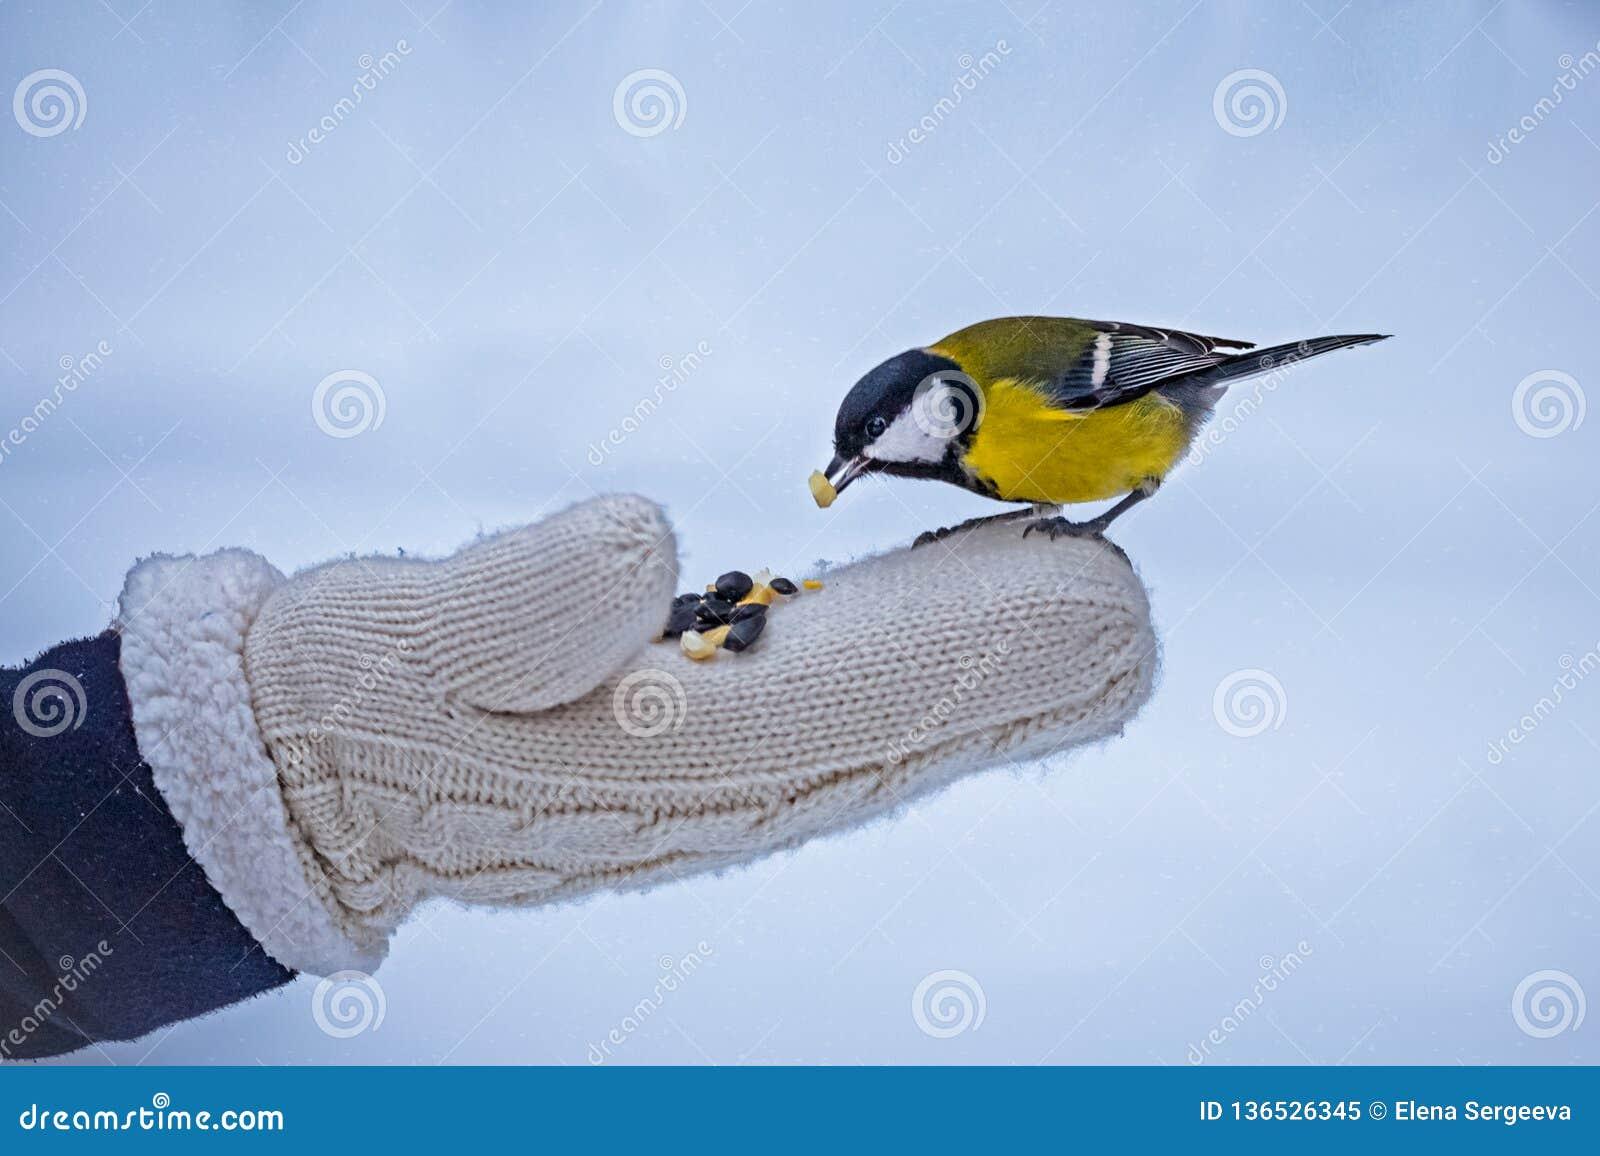 Feeding small tomtit in winter, bird care